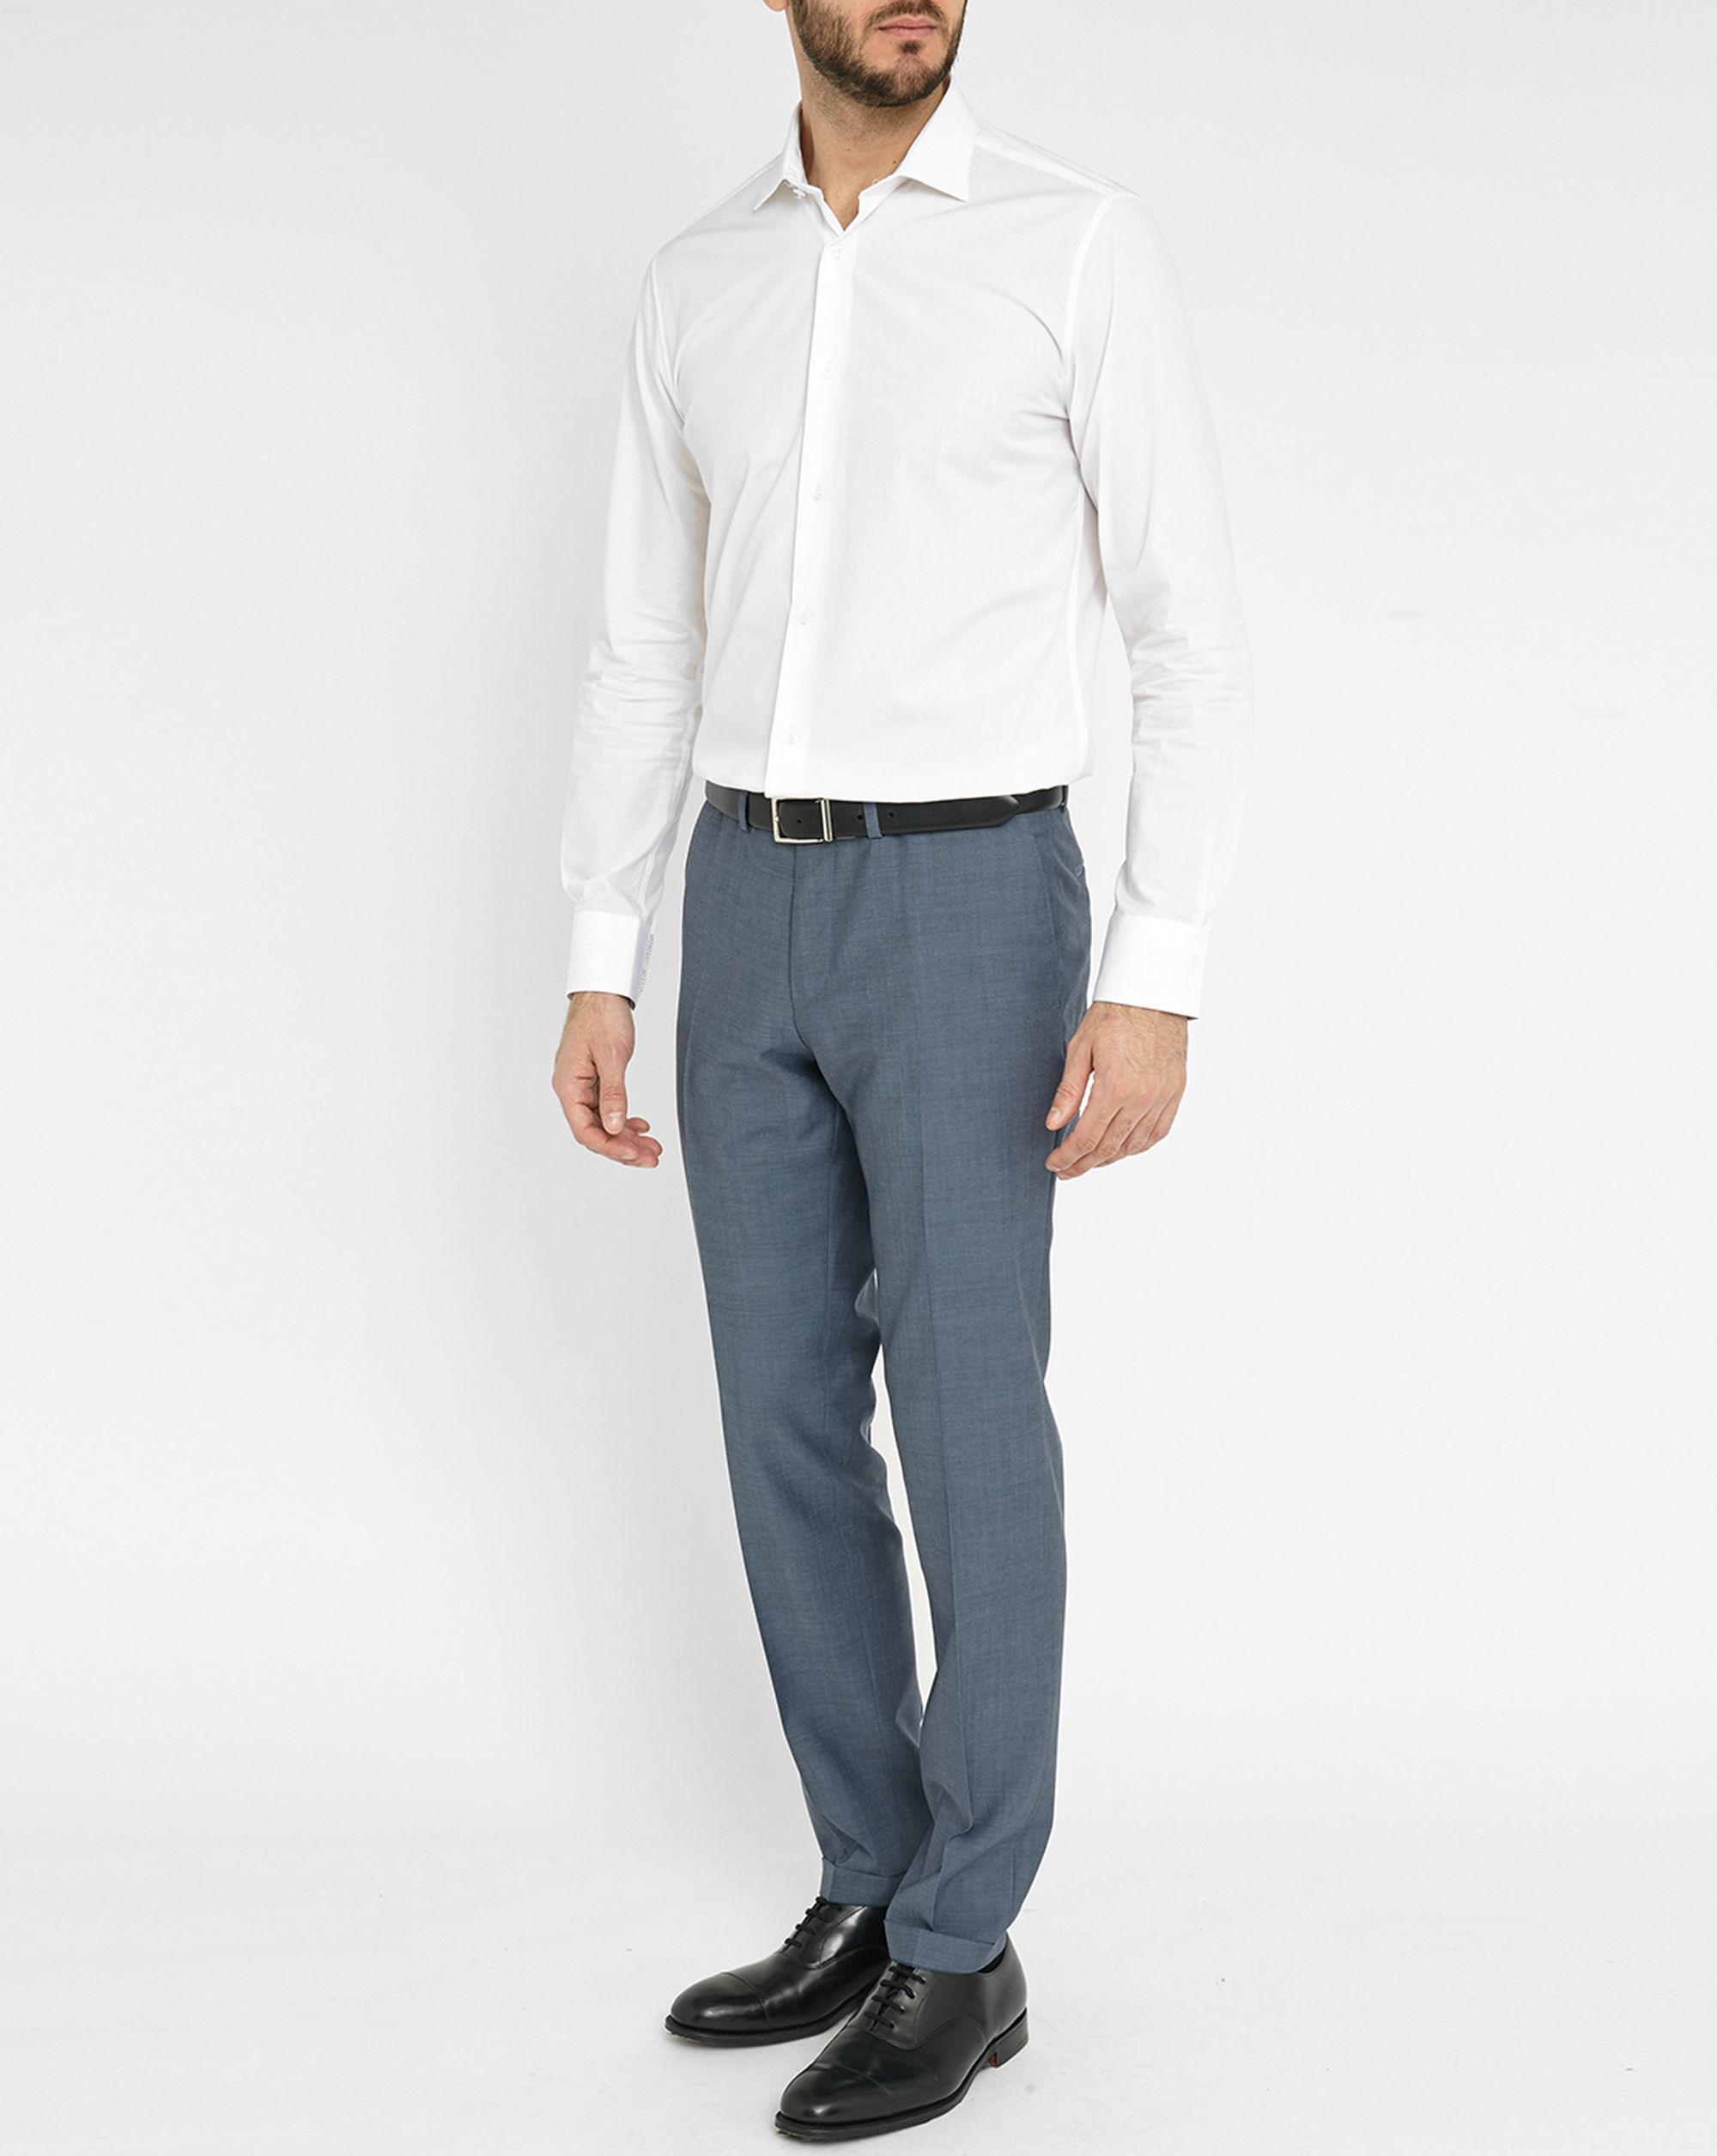 hugo boss slim fit anzug menswear on pinterest smoking. Black Bedroom Furniture Sets. Home Design Ideas